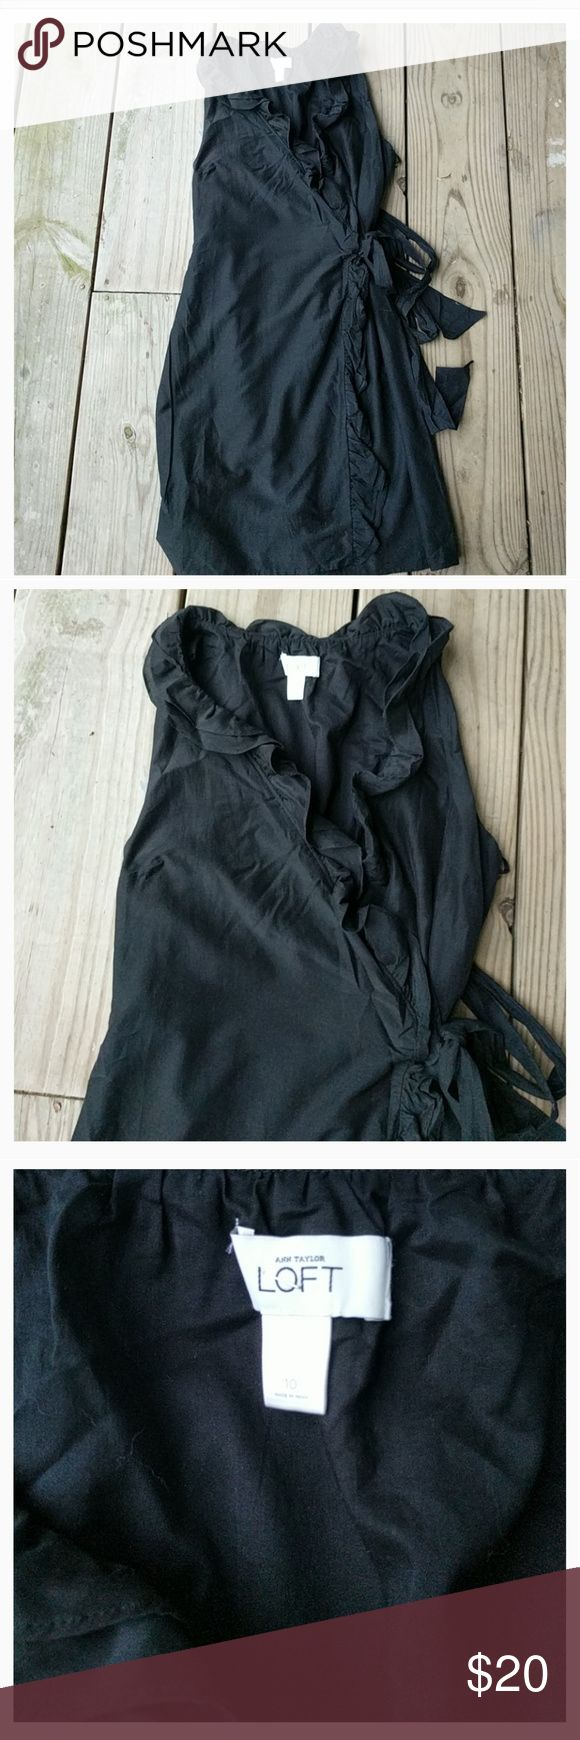 Beautiful Ann Taylor Loft wrap dress Black, cotton/silk, ruffle trim, wrap around, size 10 LOFT Dresses Midi